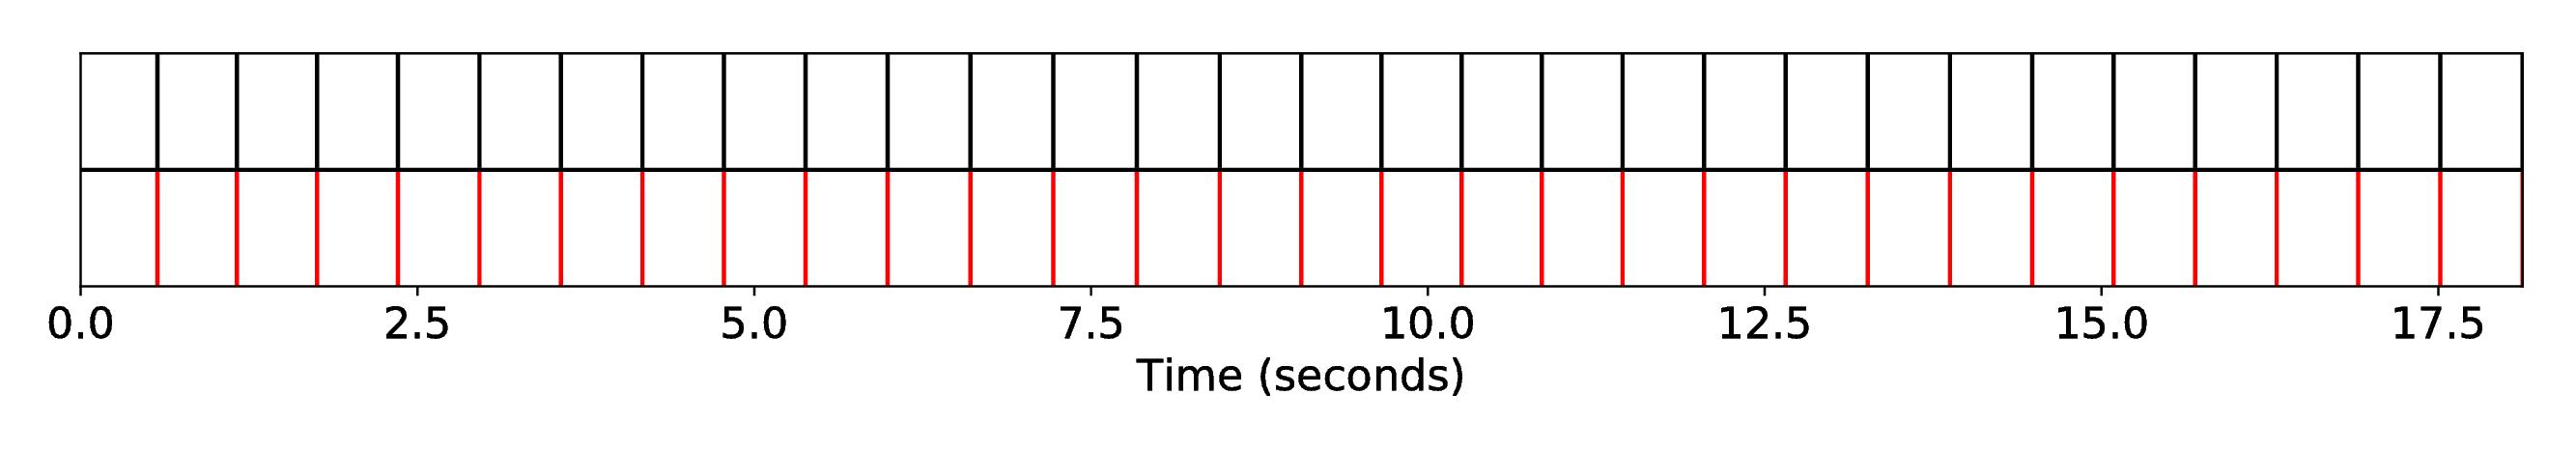 DP1_INT1_R-RW-Water__S-Fandango__SequenceAlignment